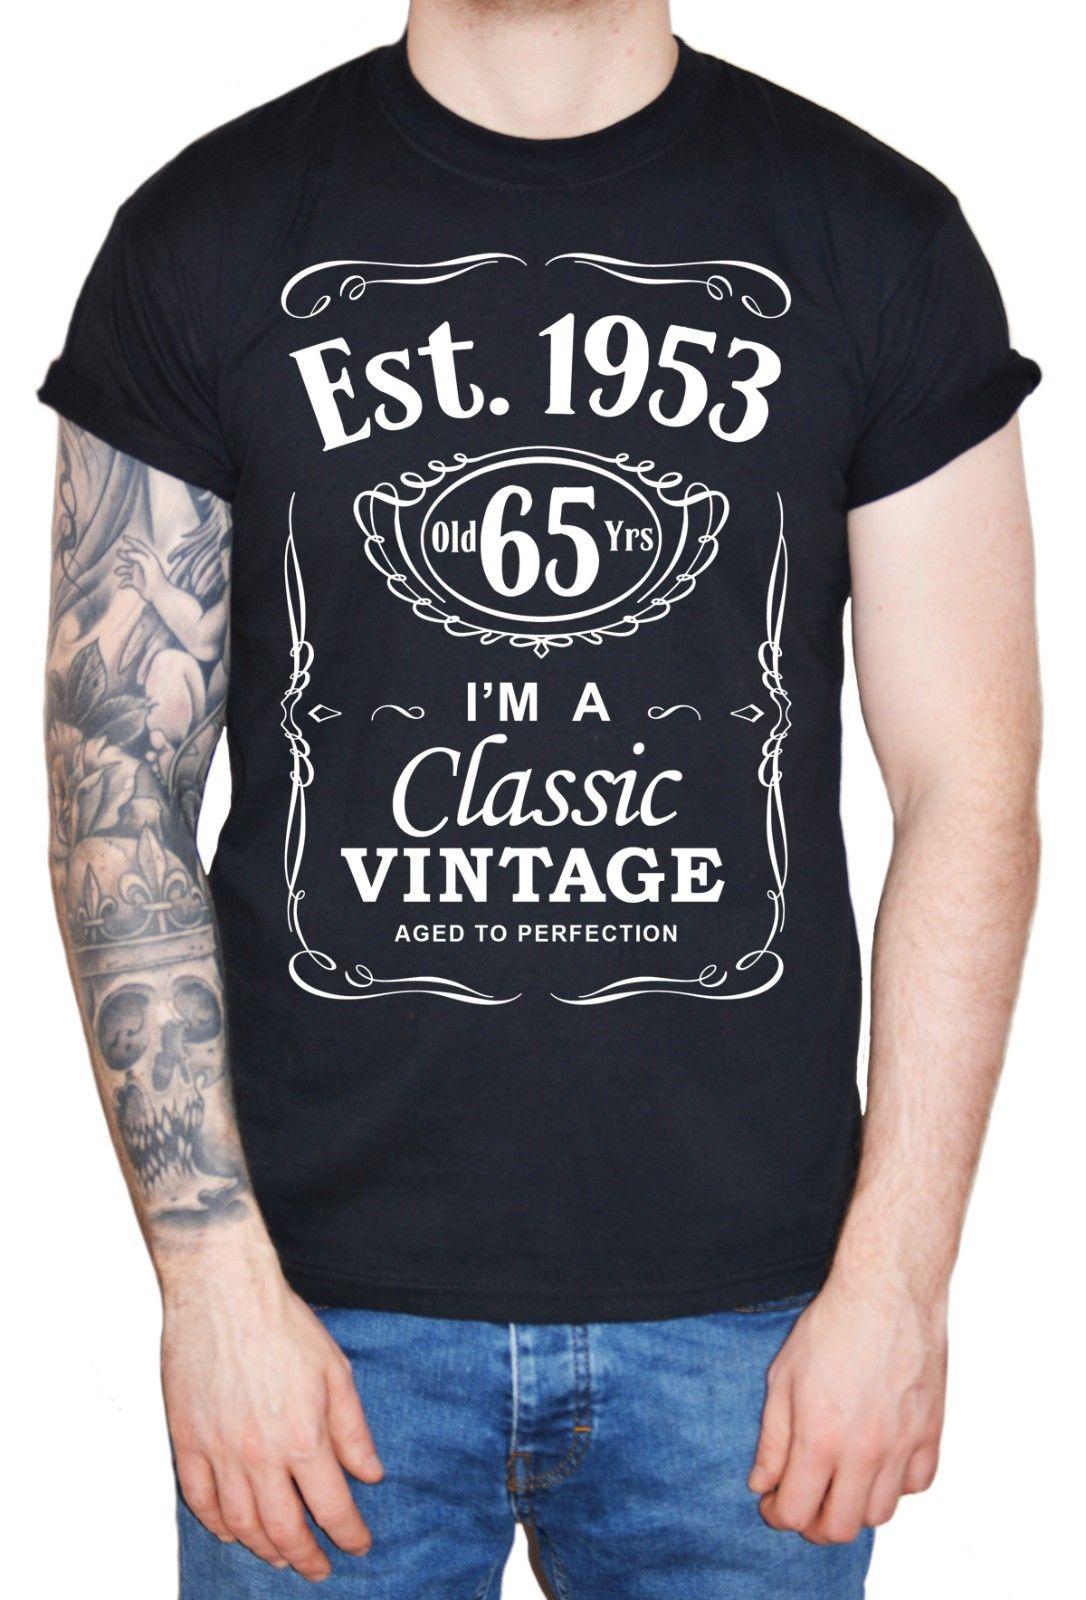 847c2066 2019 New Cool Tee Shirt Men's 65th Birthday T-Shirt Est 1953 Vintage Man  Sixty Fifth 65 years Gift